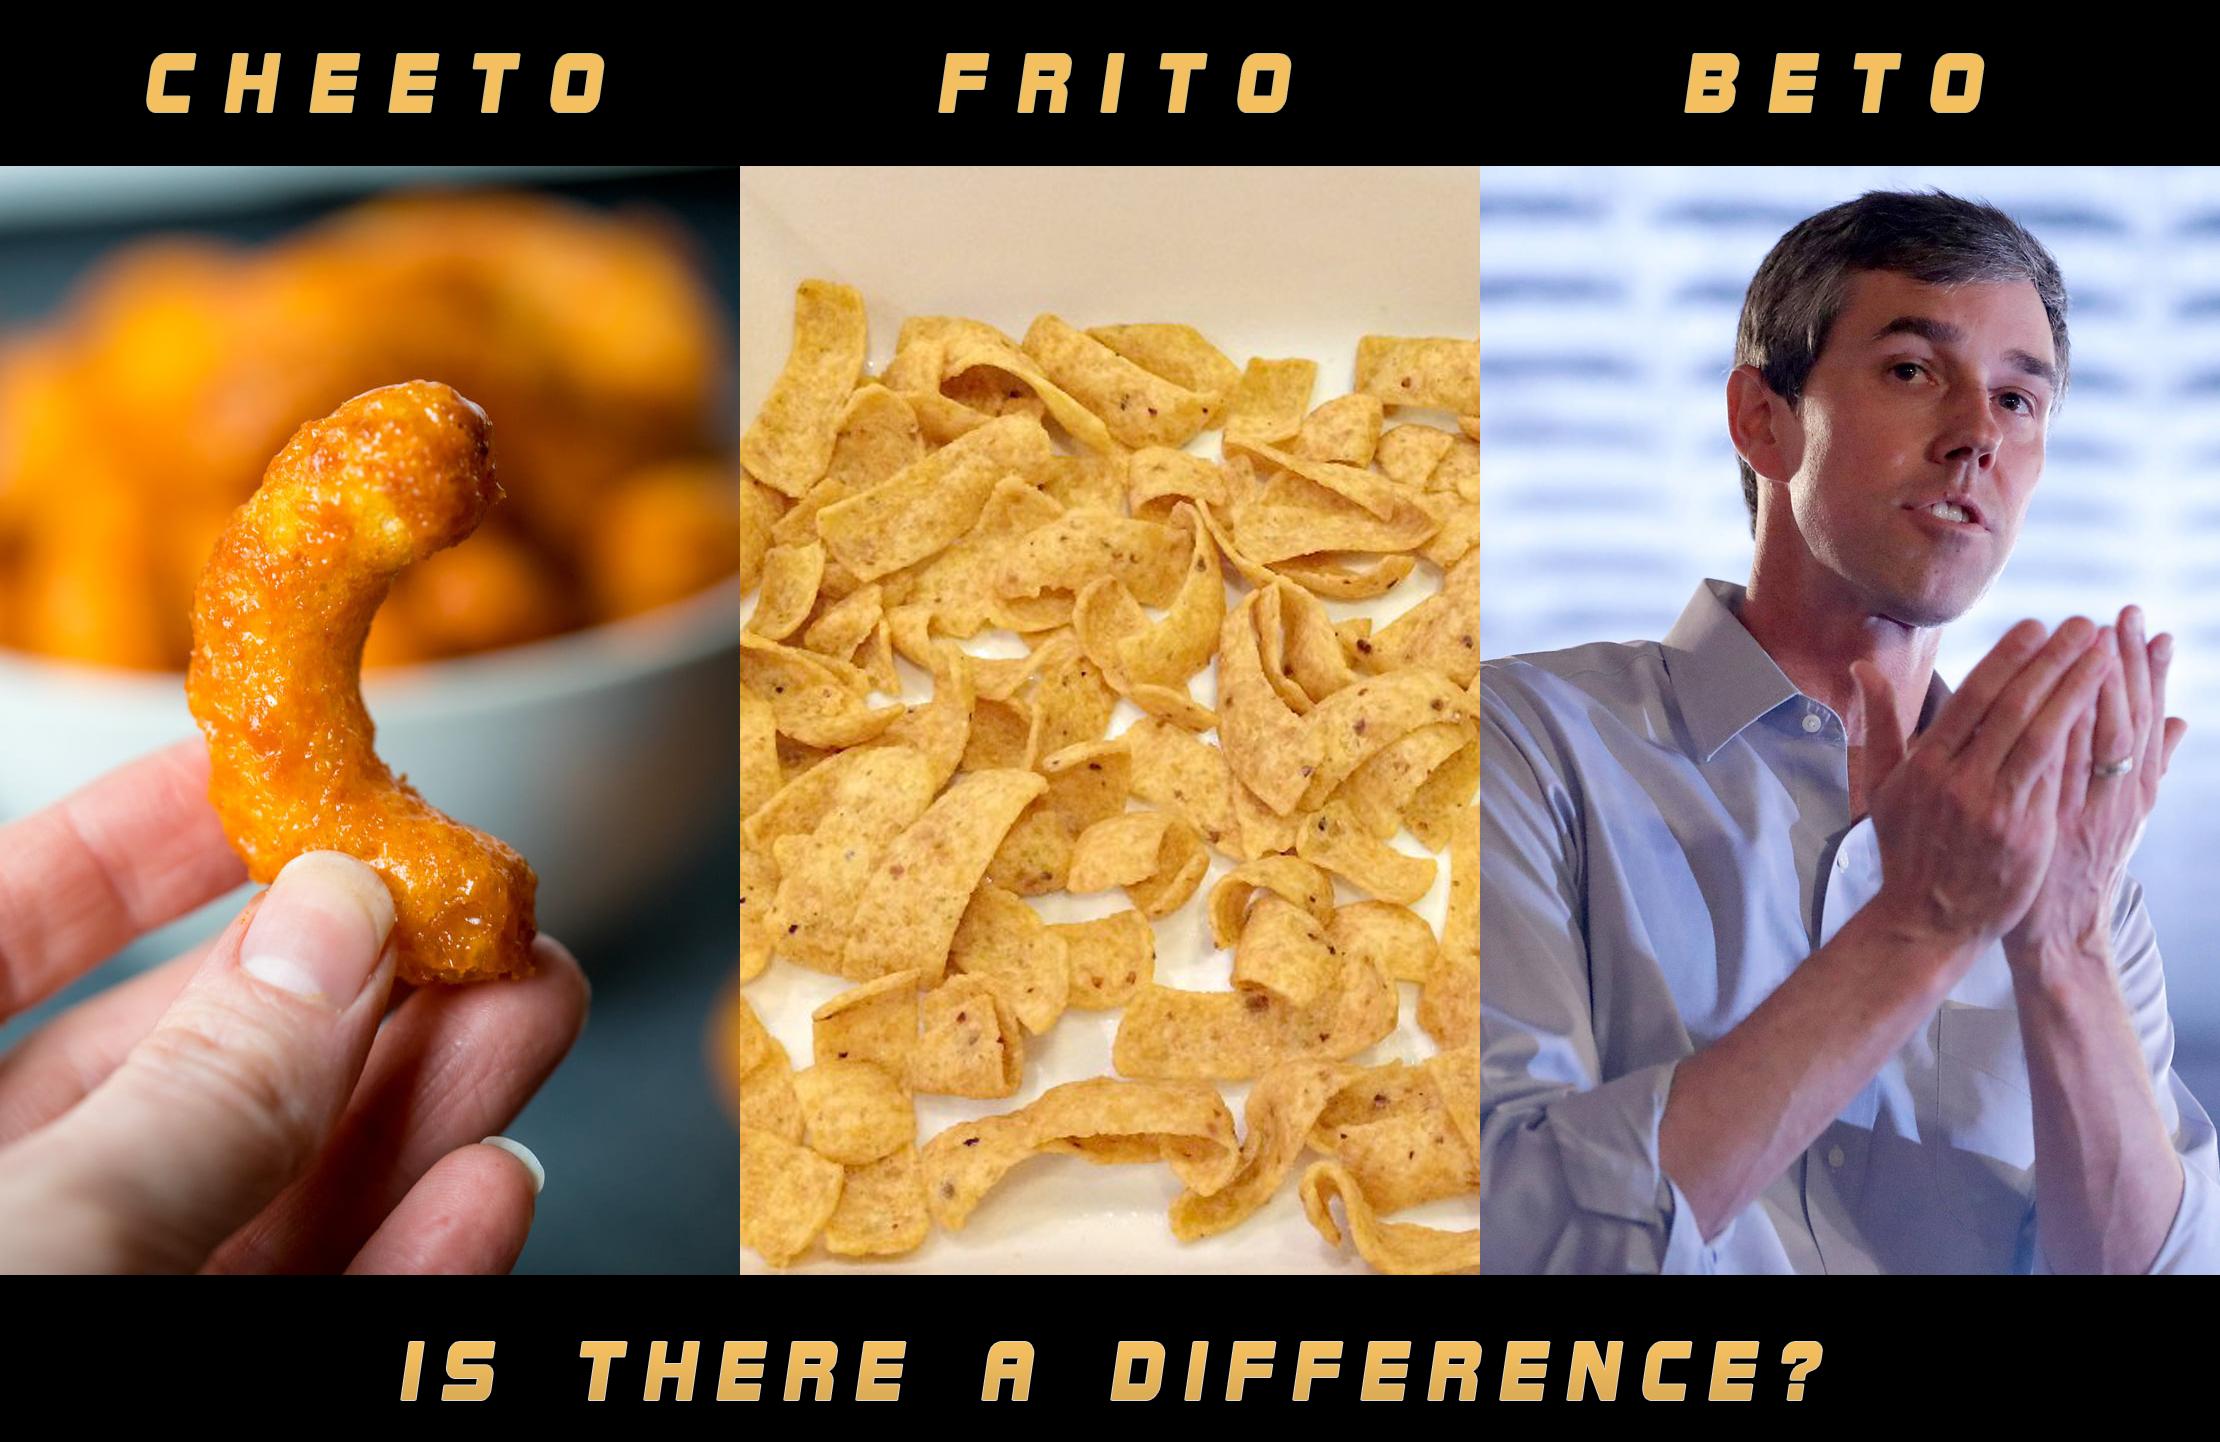 cheeto-frito-beto copy.png